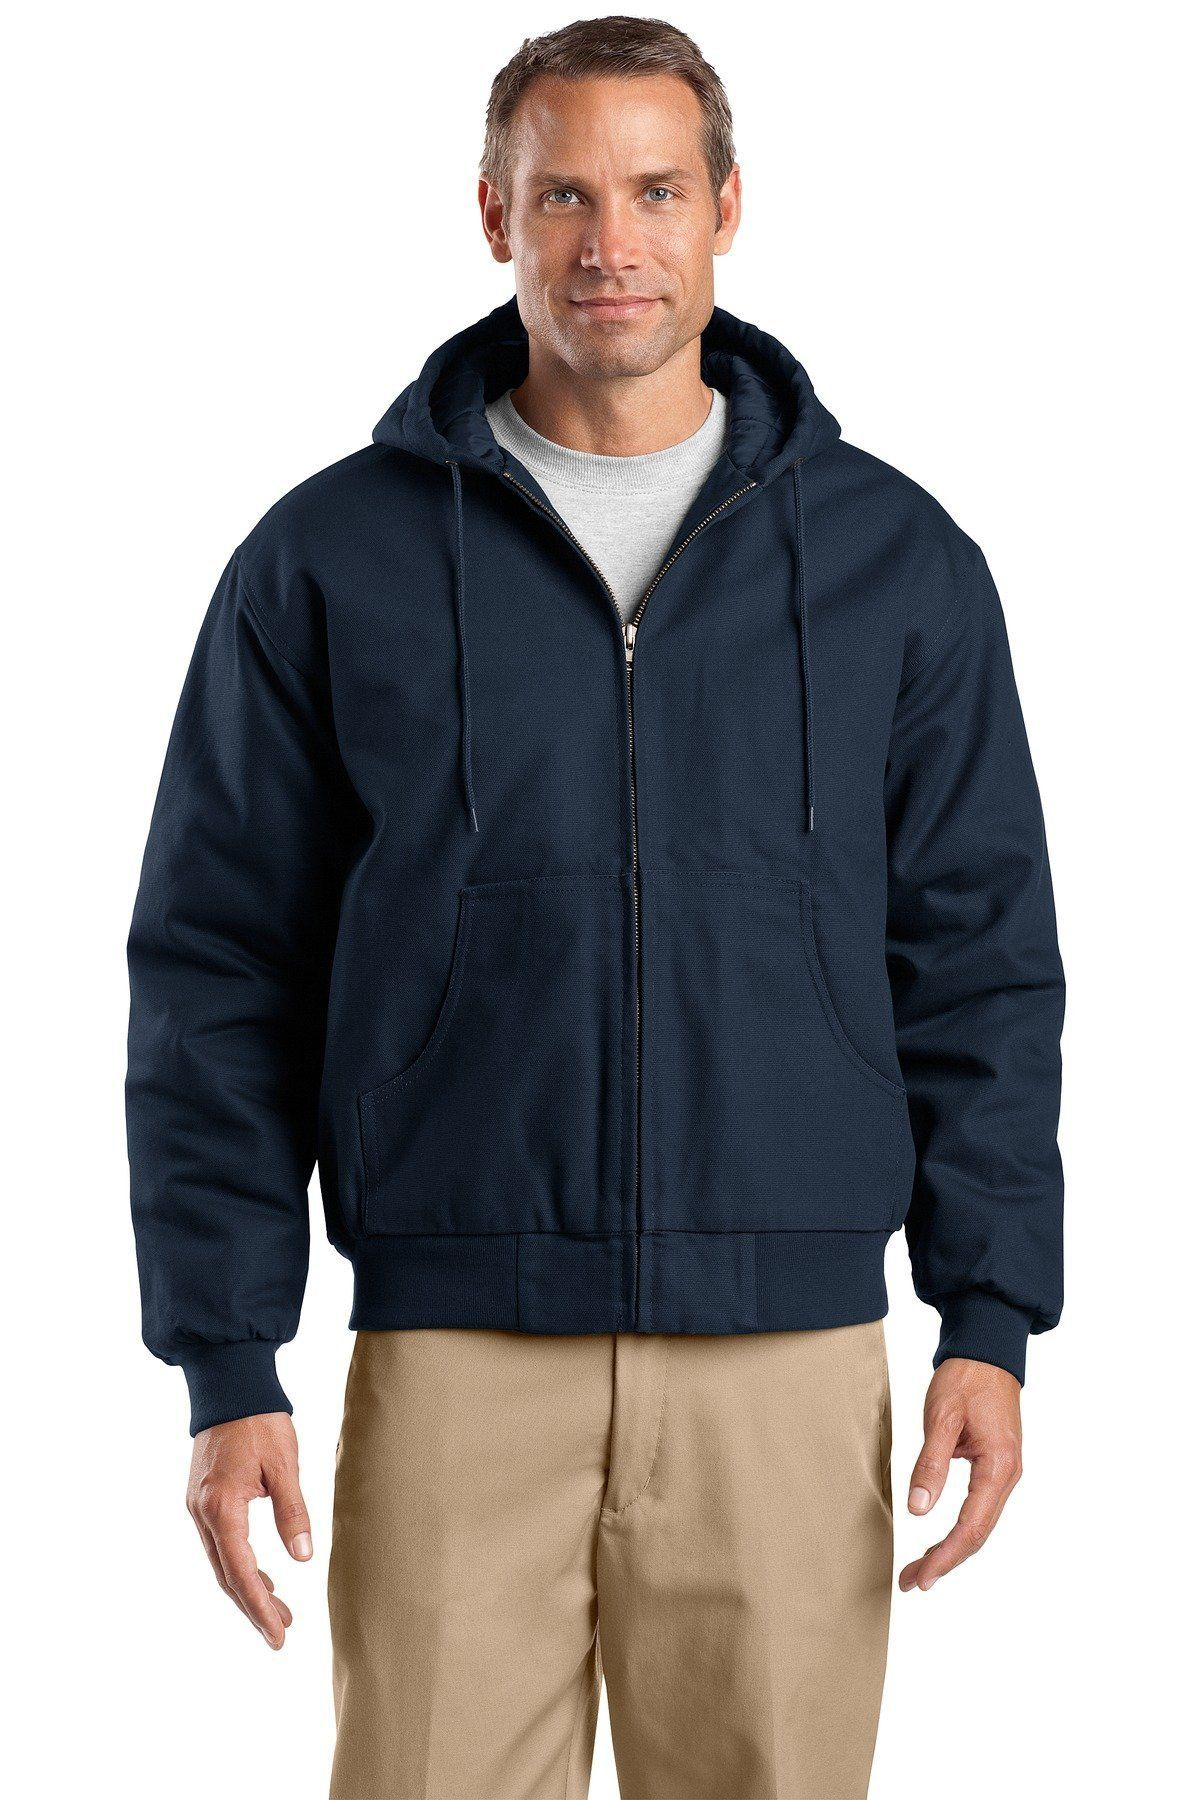 CornerStone Tall Duck Cloth Hooded Work Jacket TLJ763H Navy